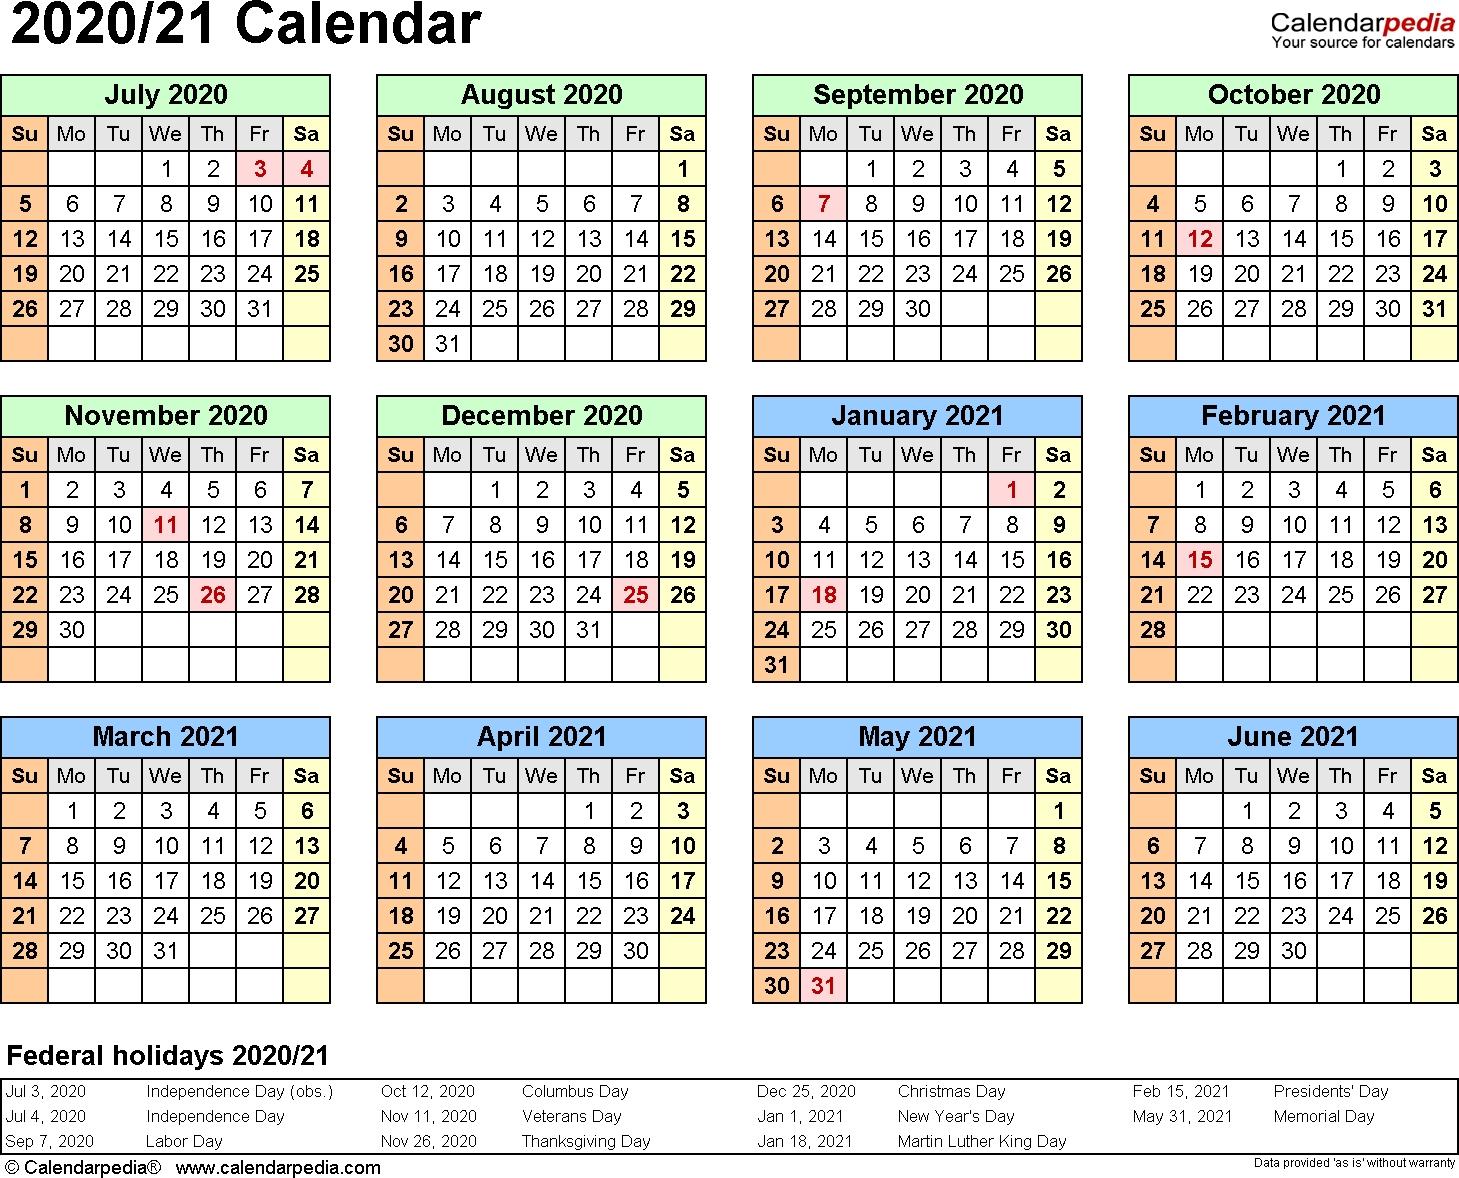 Split Year Calendars 2020/2021 (July To June) - Word Templates Perky Calendarpedia 2020 Printable South Africa